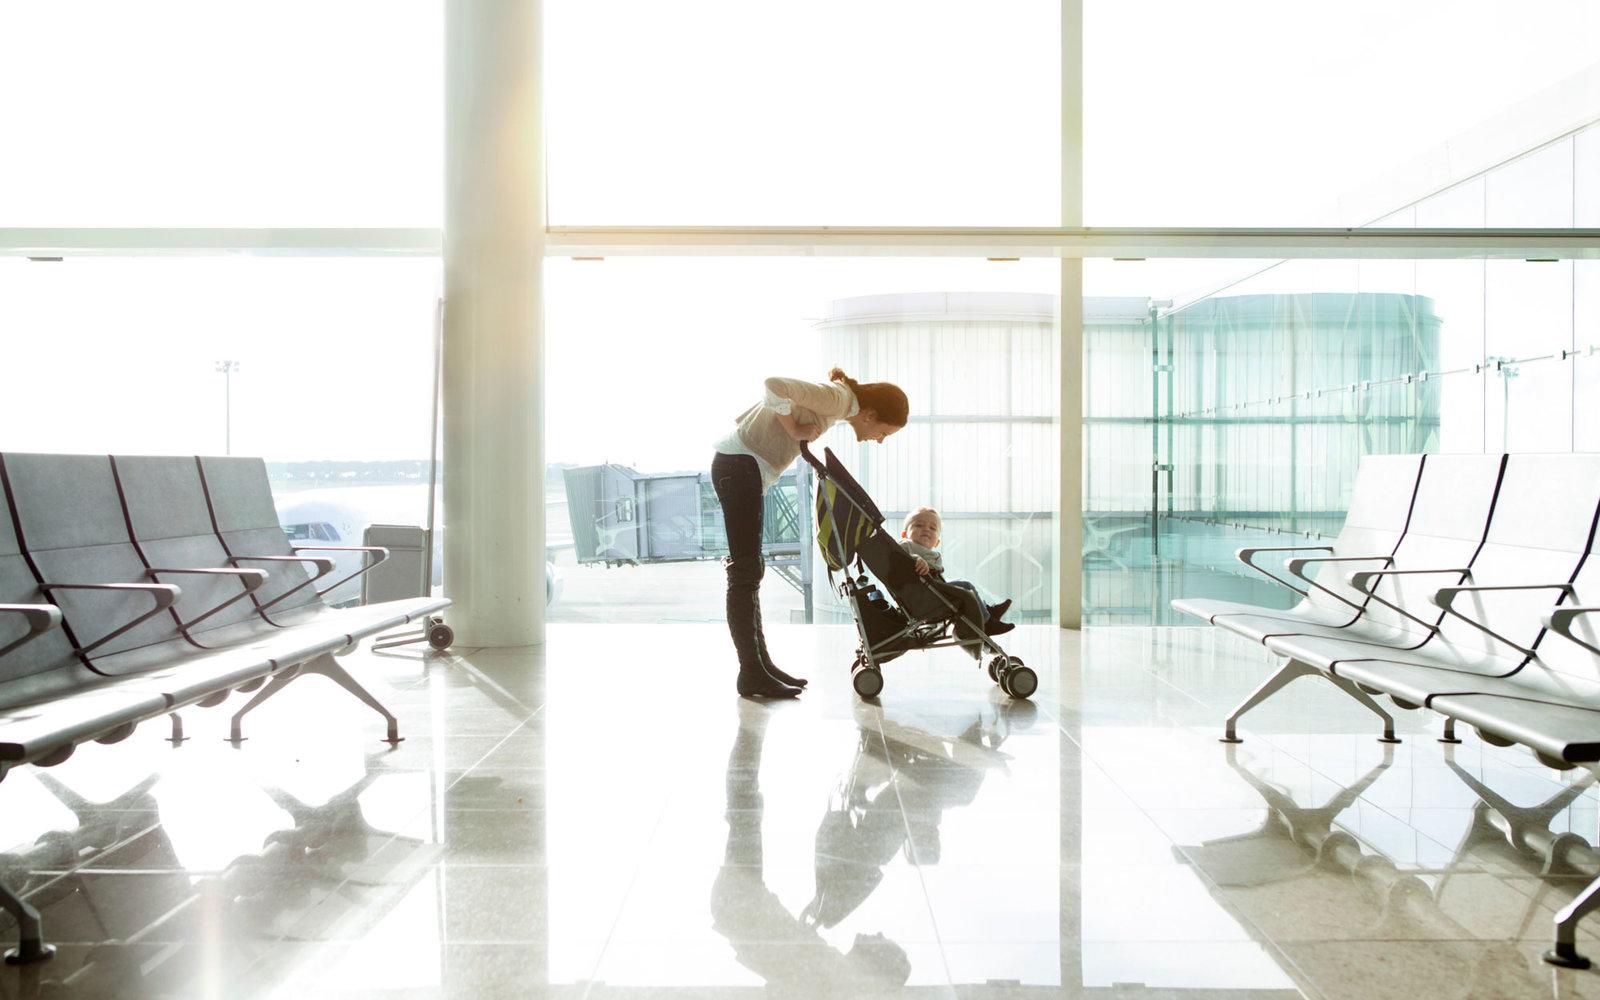 airport-baby-parenting0316.jpg